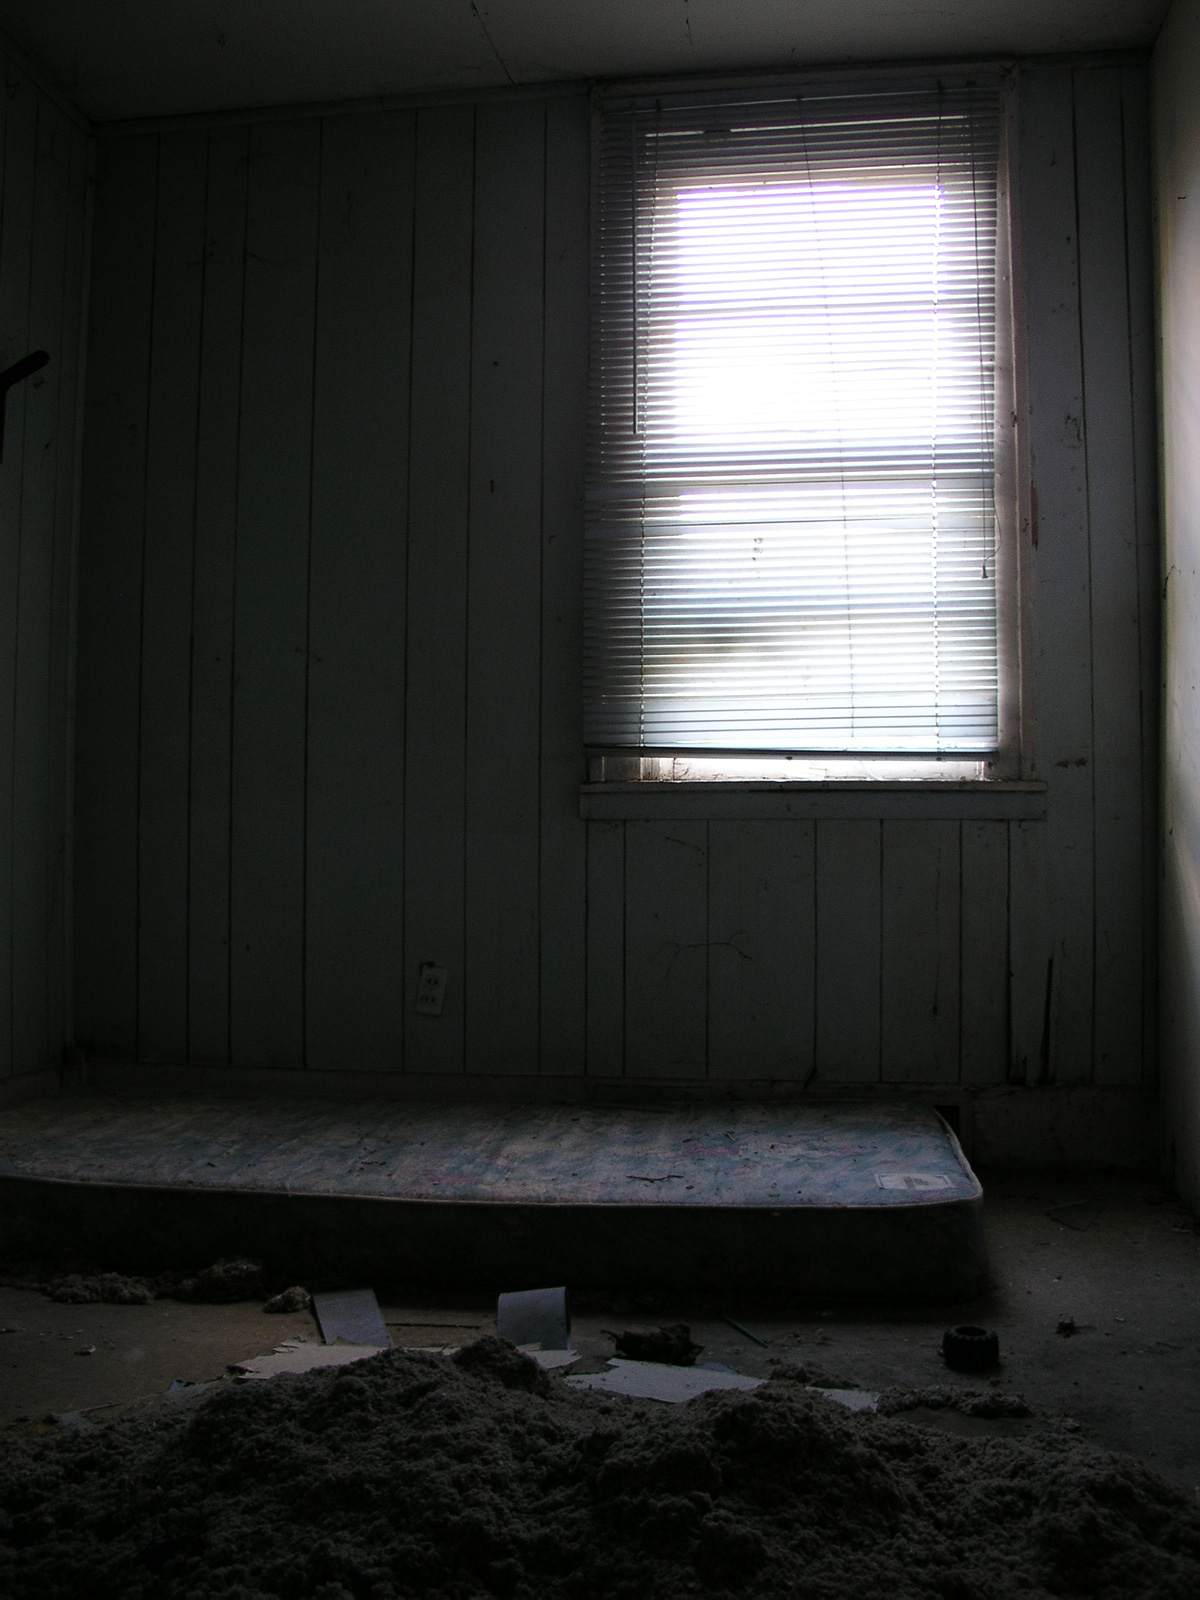 Dark Room: Tuned Into AJ's World: Artifact 2 Dark Room